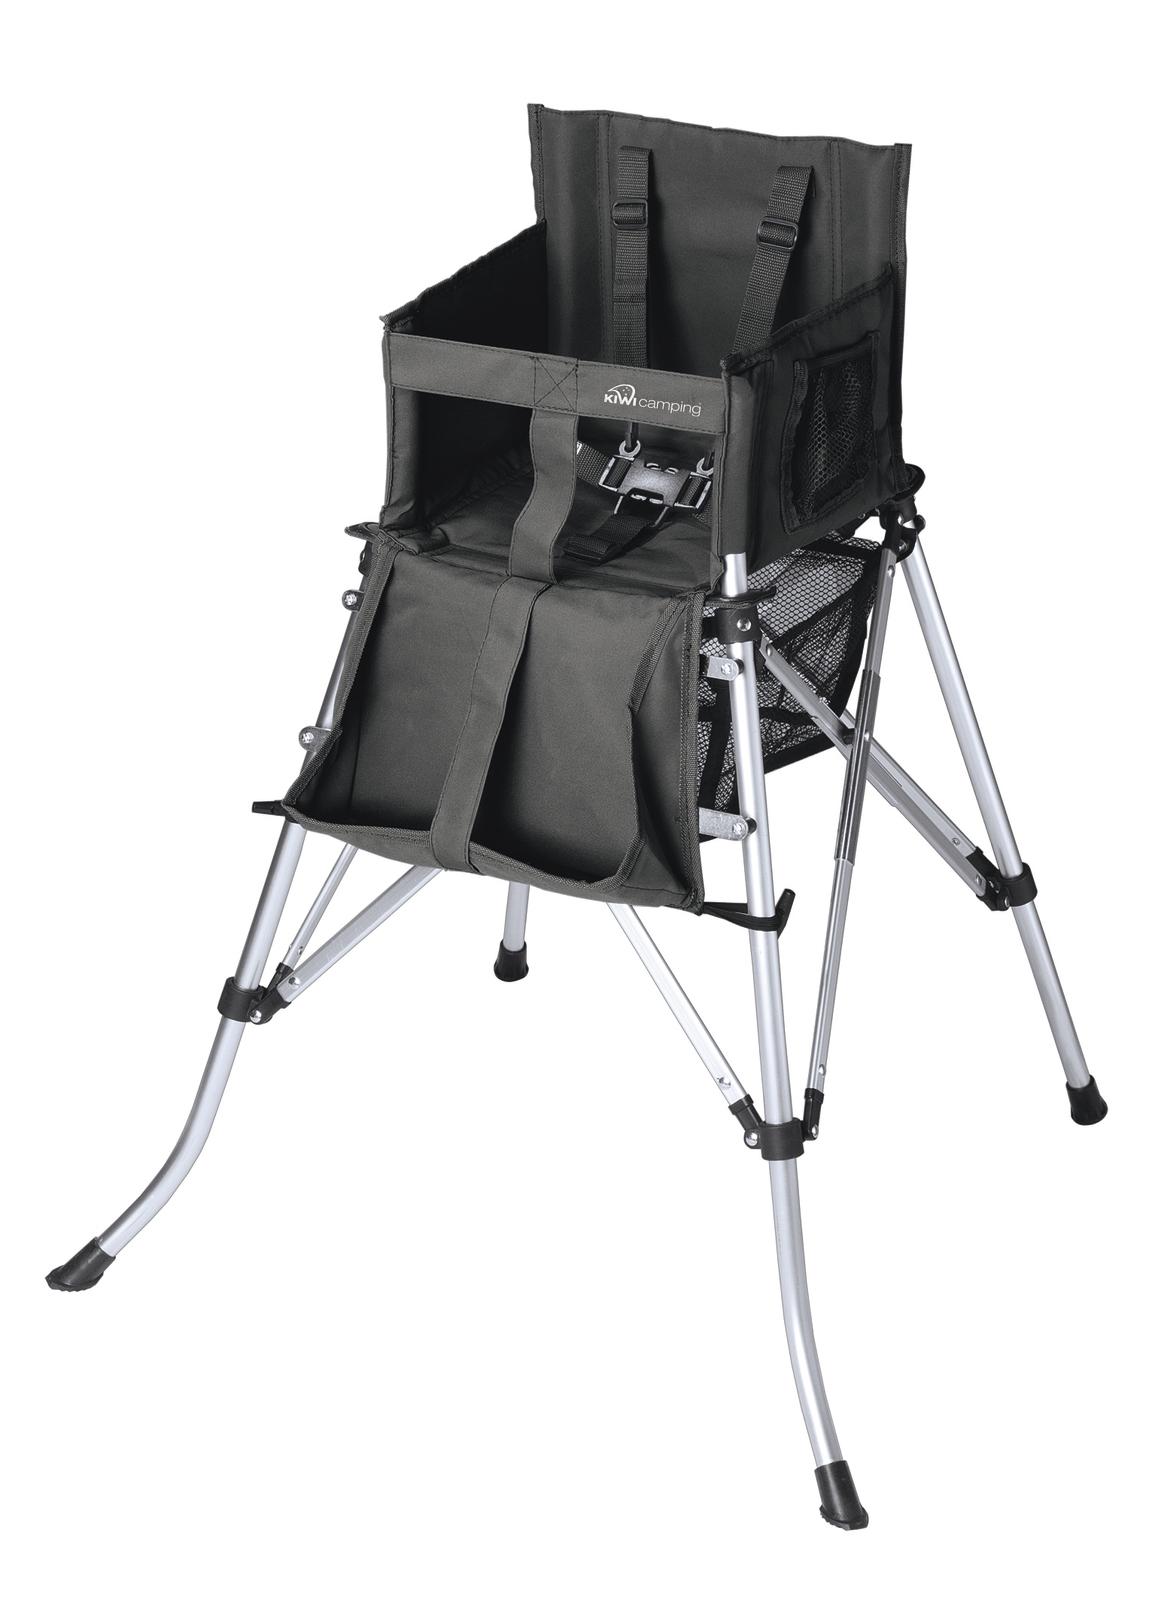 Buy Kiwi Camping Tiny Tot Portable High Chair Baby At Mighty Ape Australia